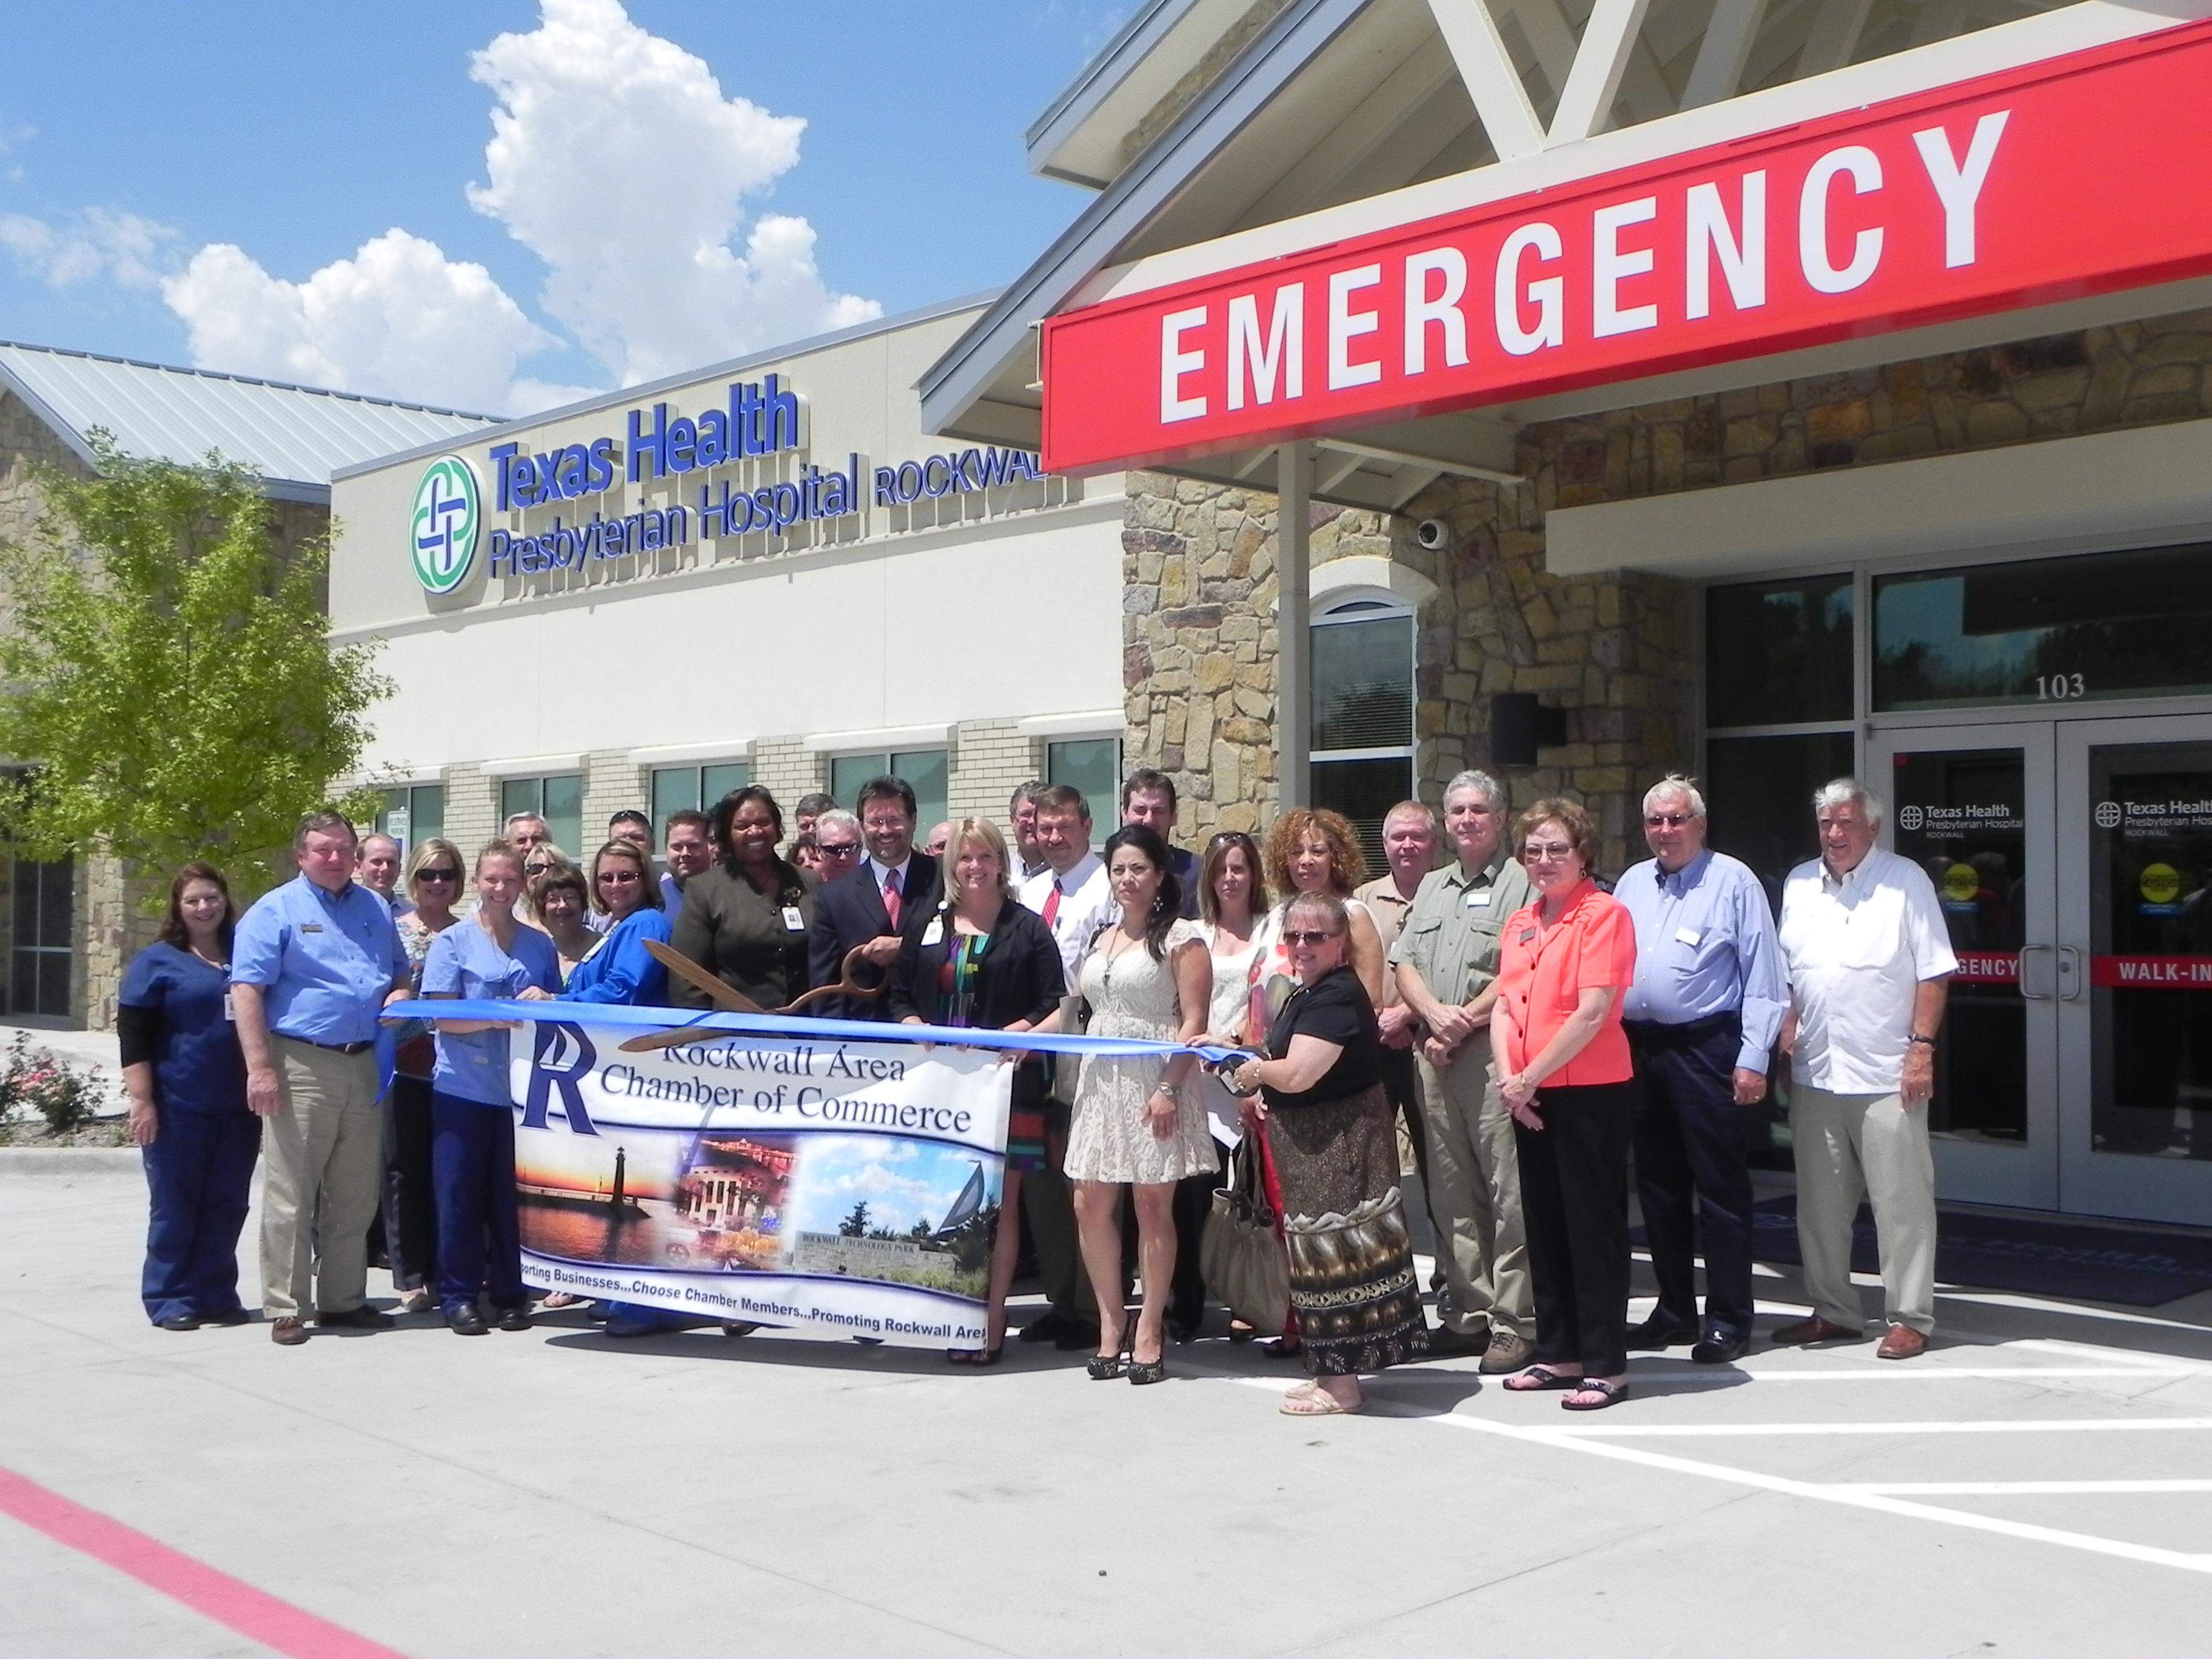 Rockwall Chamber hosts ribbon cutting for Texas Health Presbyterian's new ER